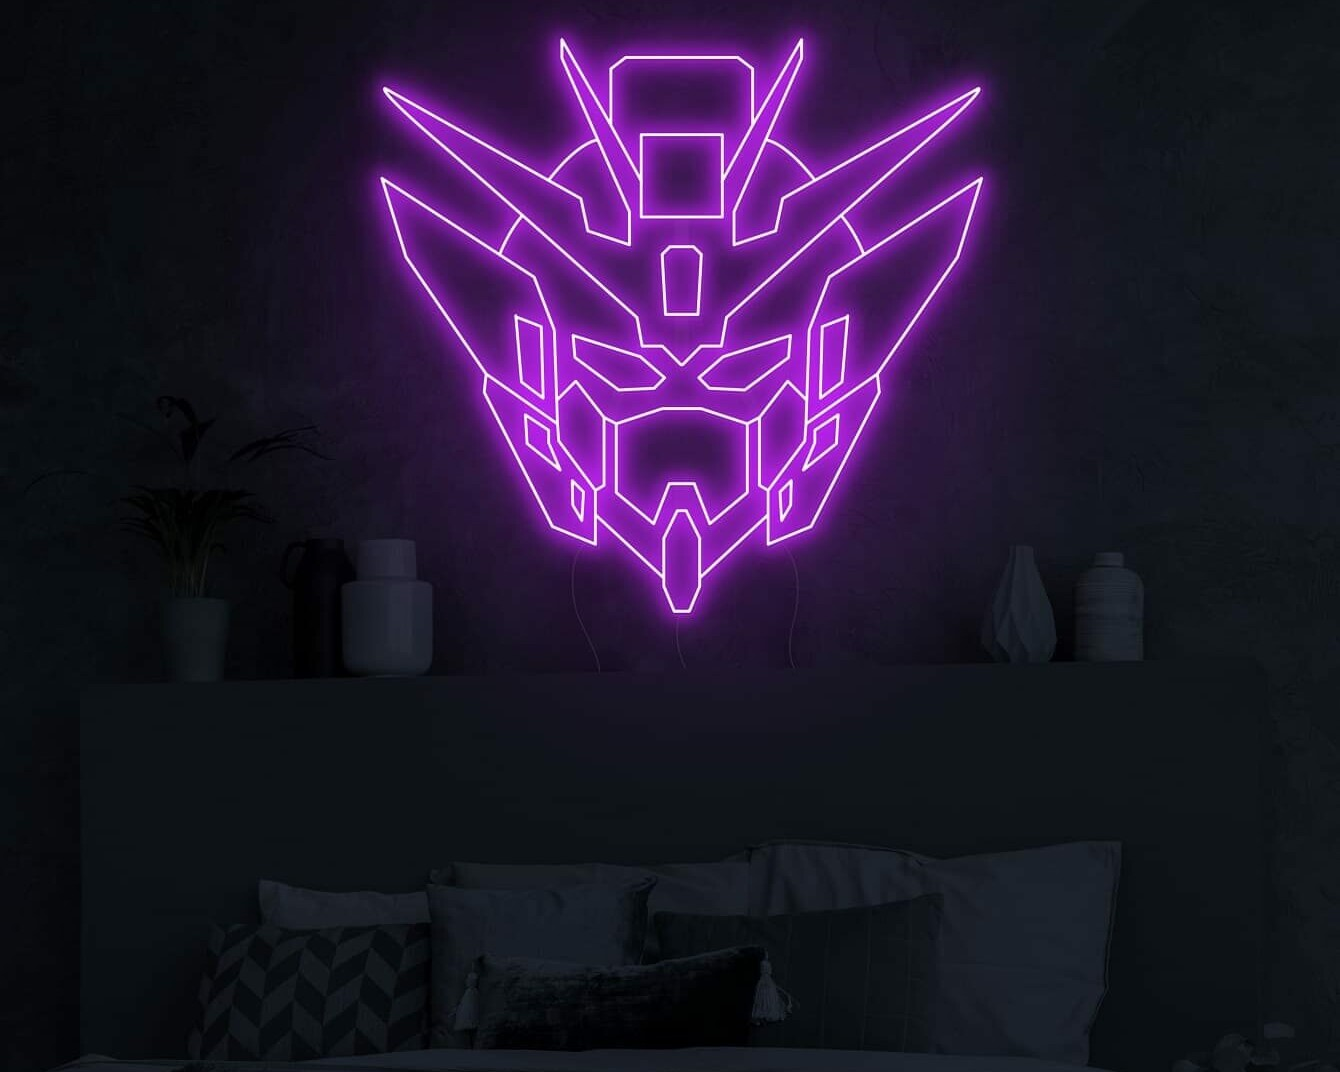 gundam neon signs